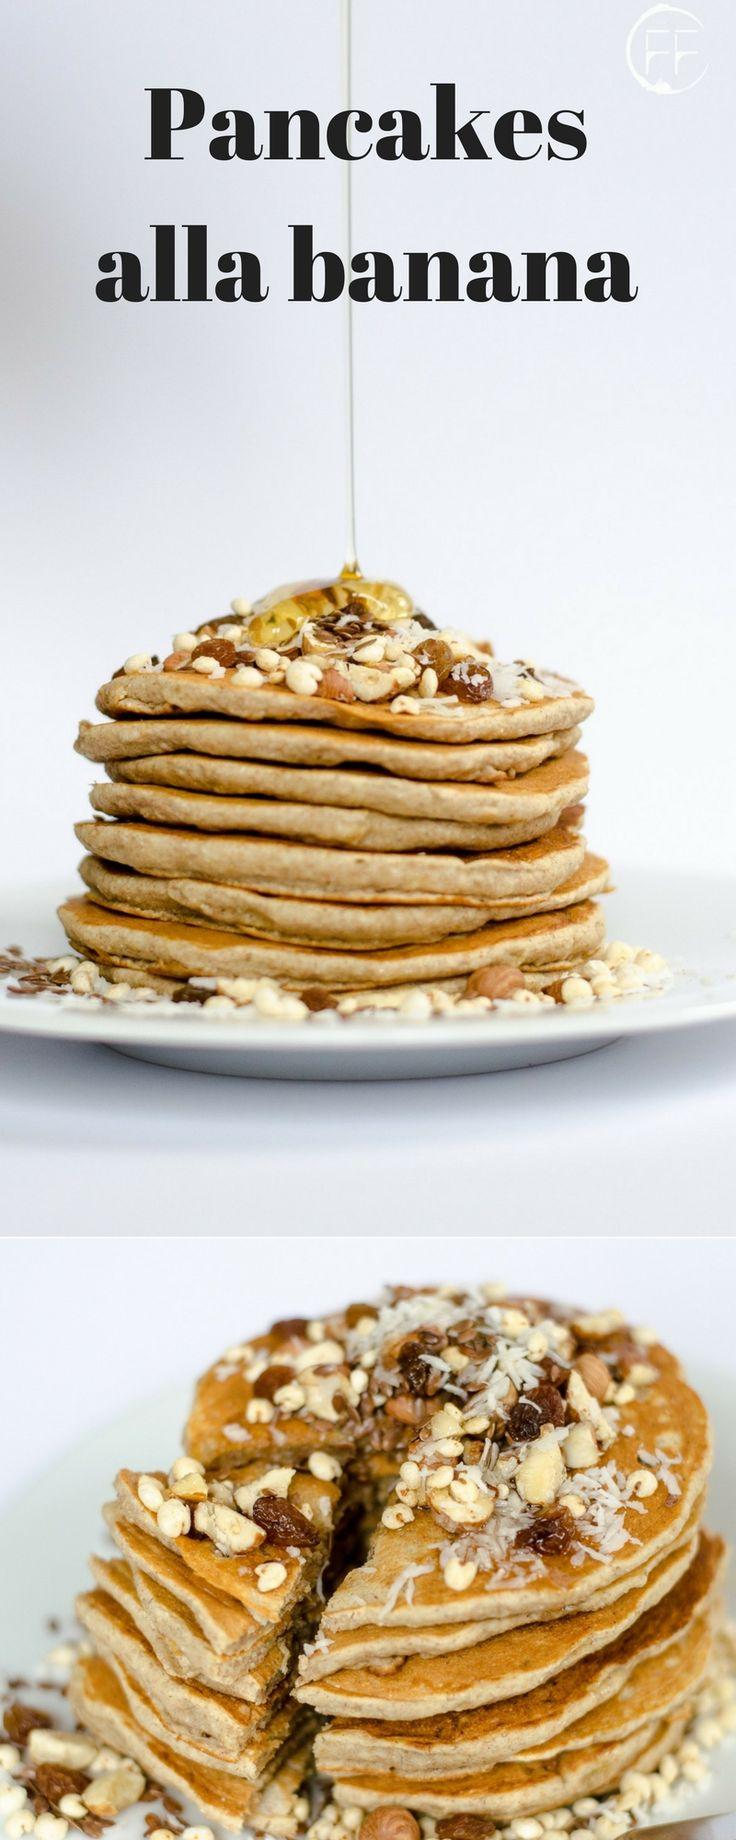 Pancakes vegan alla banana. Sul blog altre ricette vegan light, estive, dolci vegani, senza glutine, per la dieta, proteiche, vegetariane e vegane, veloci e facili in italiano.